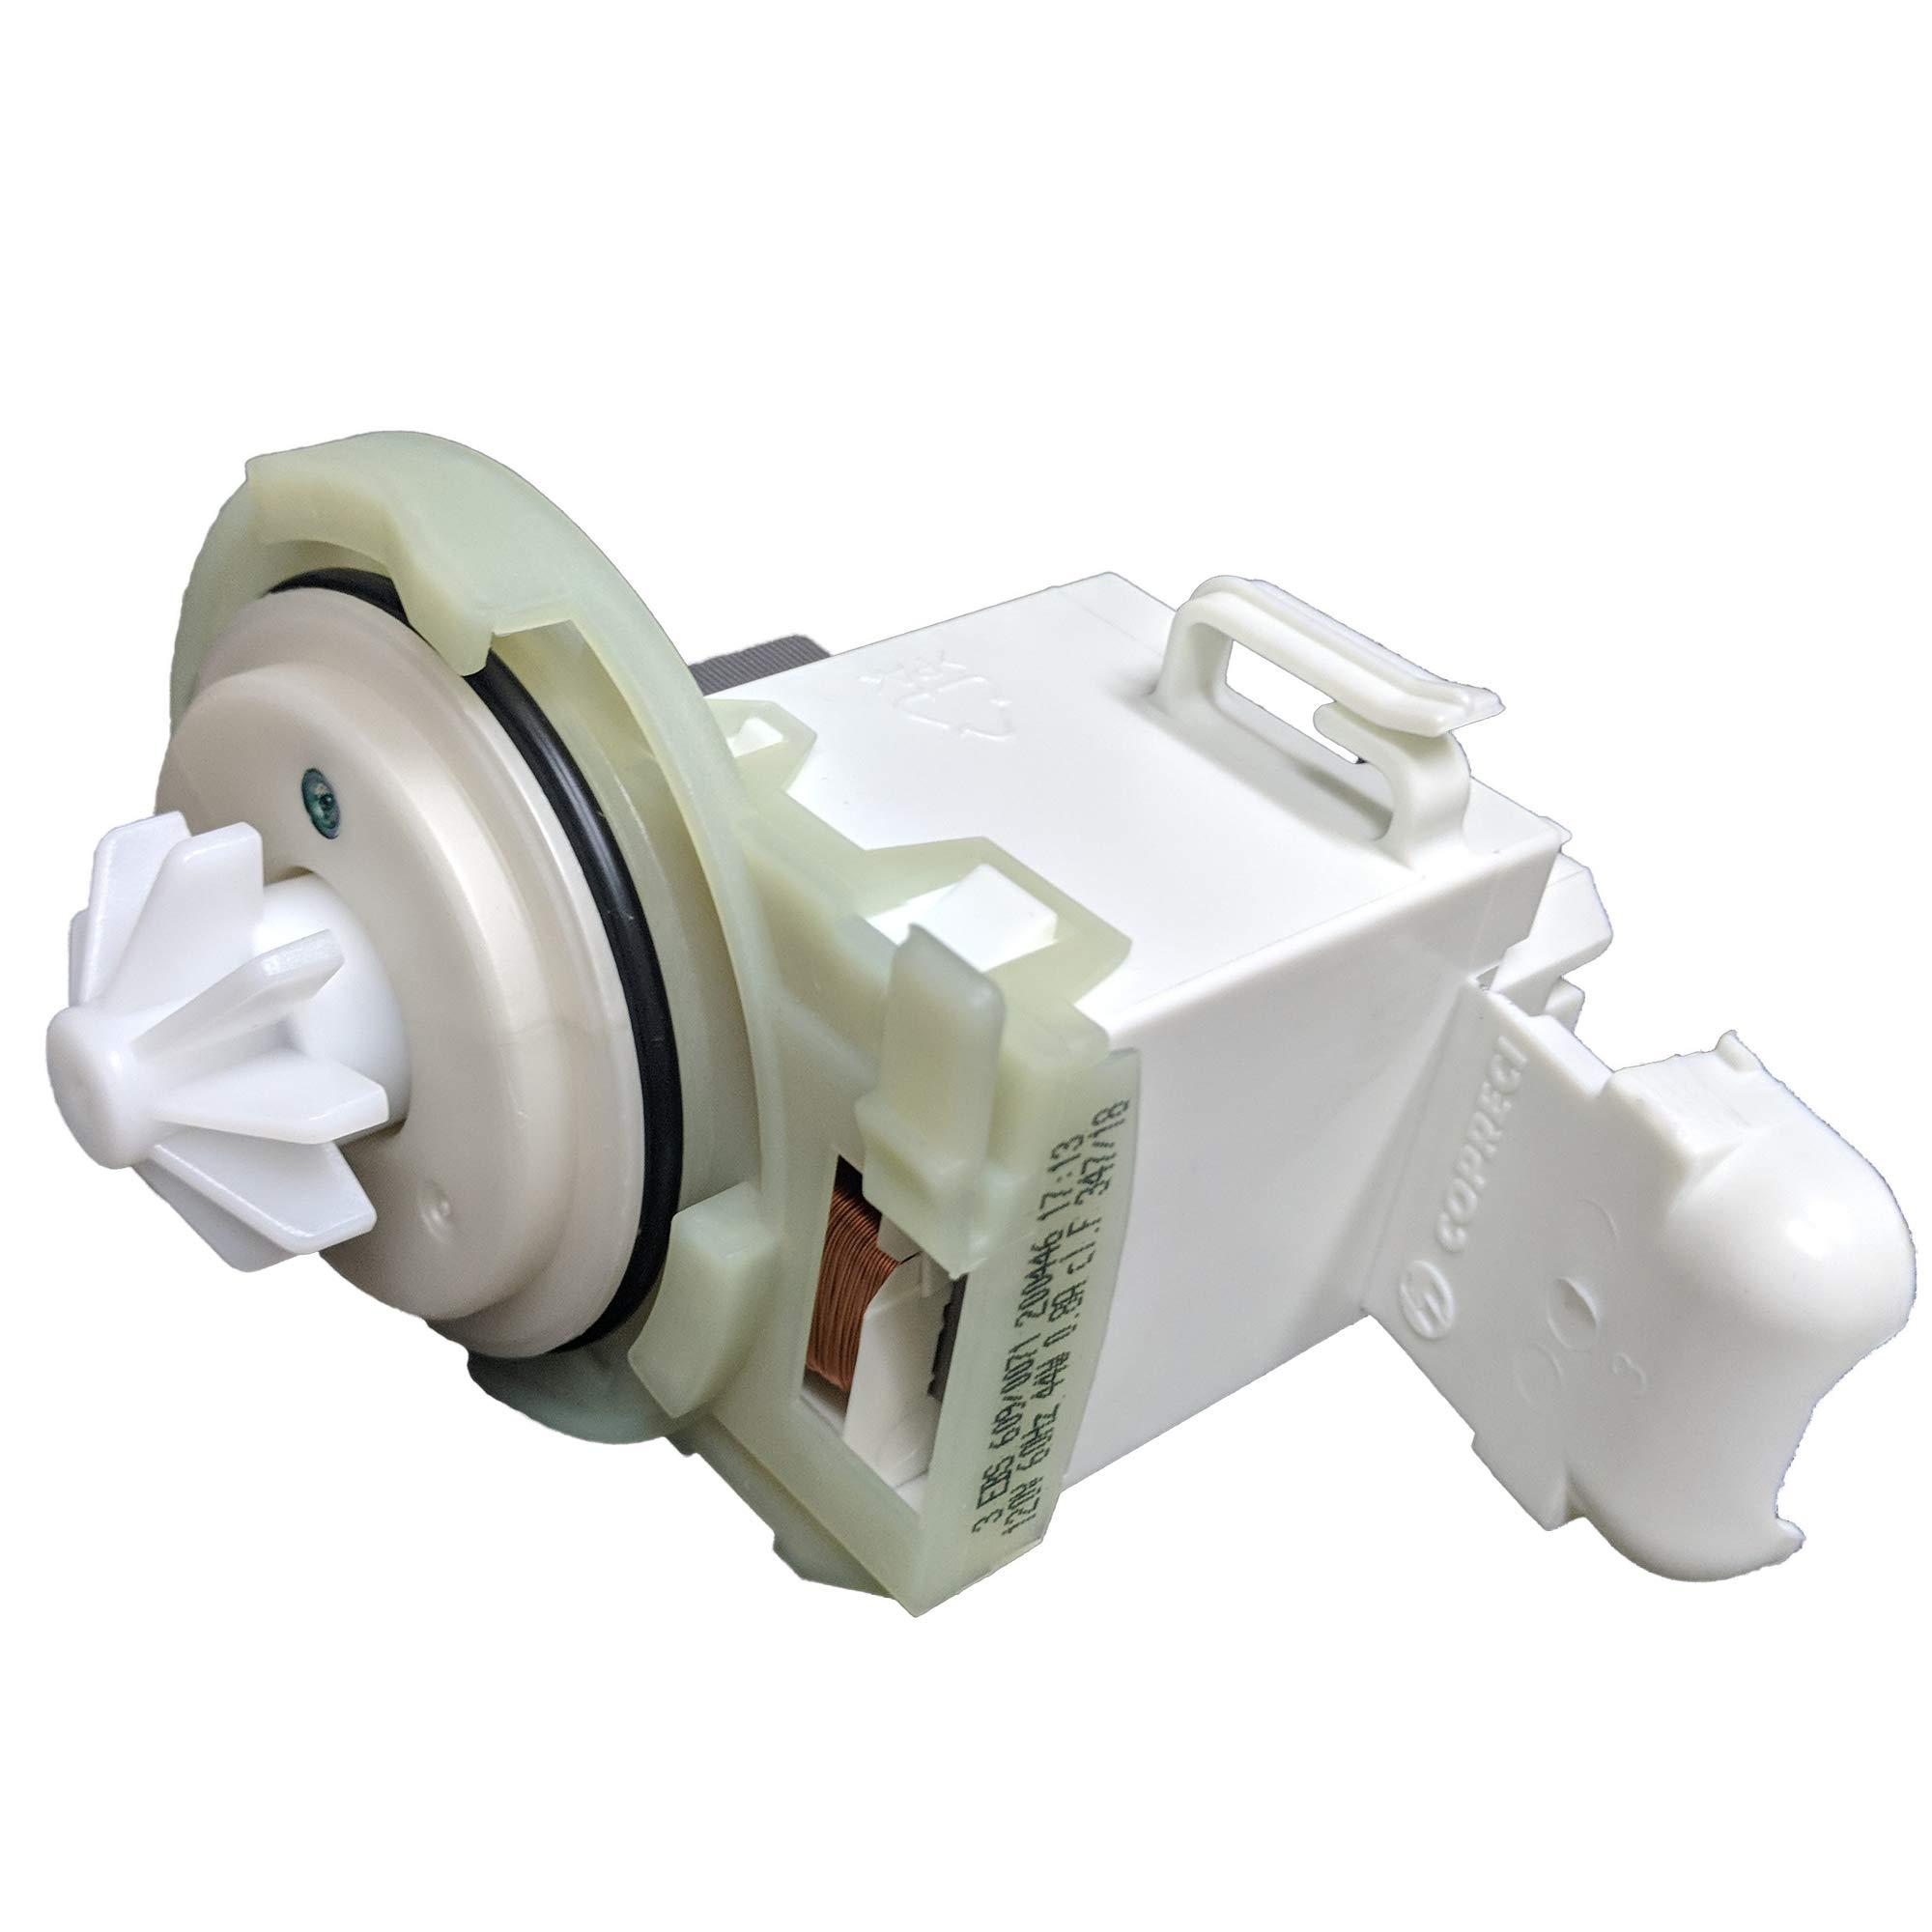 Supplying Demand 00642239 642239 Dishwasher Drain Pump Fits AP3996662 PS3479214